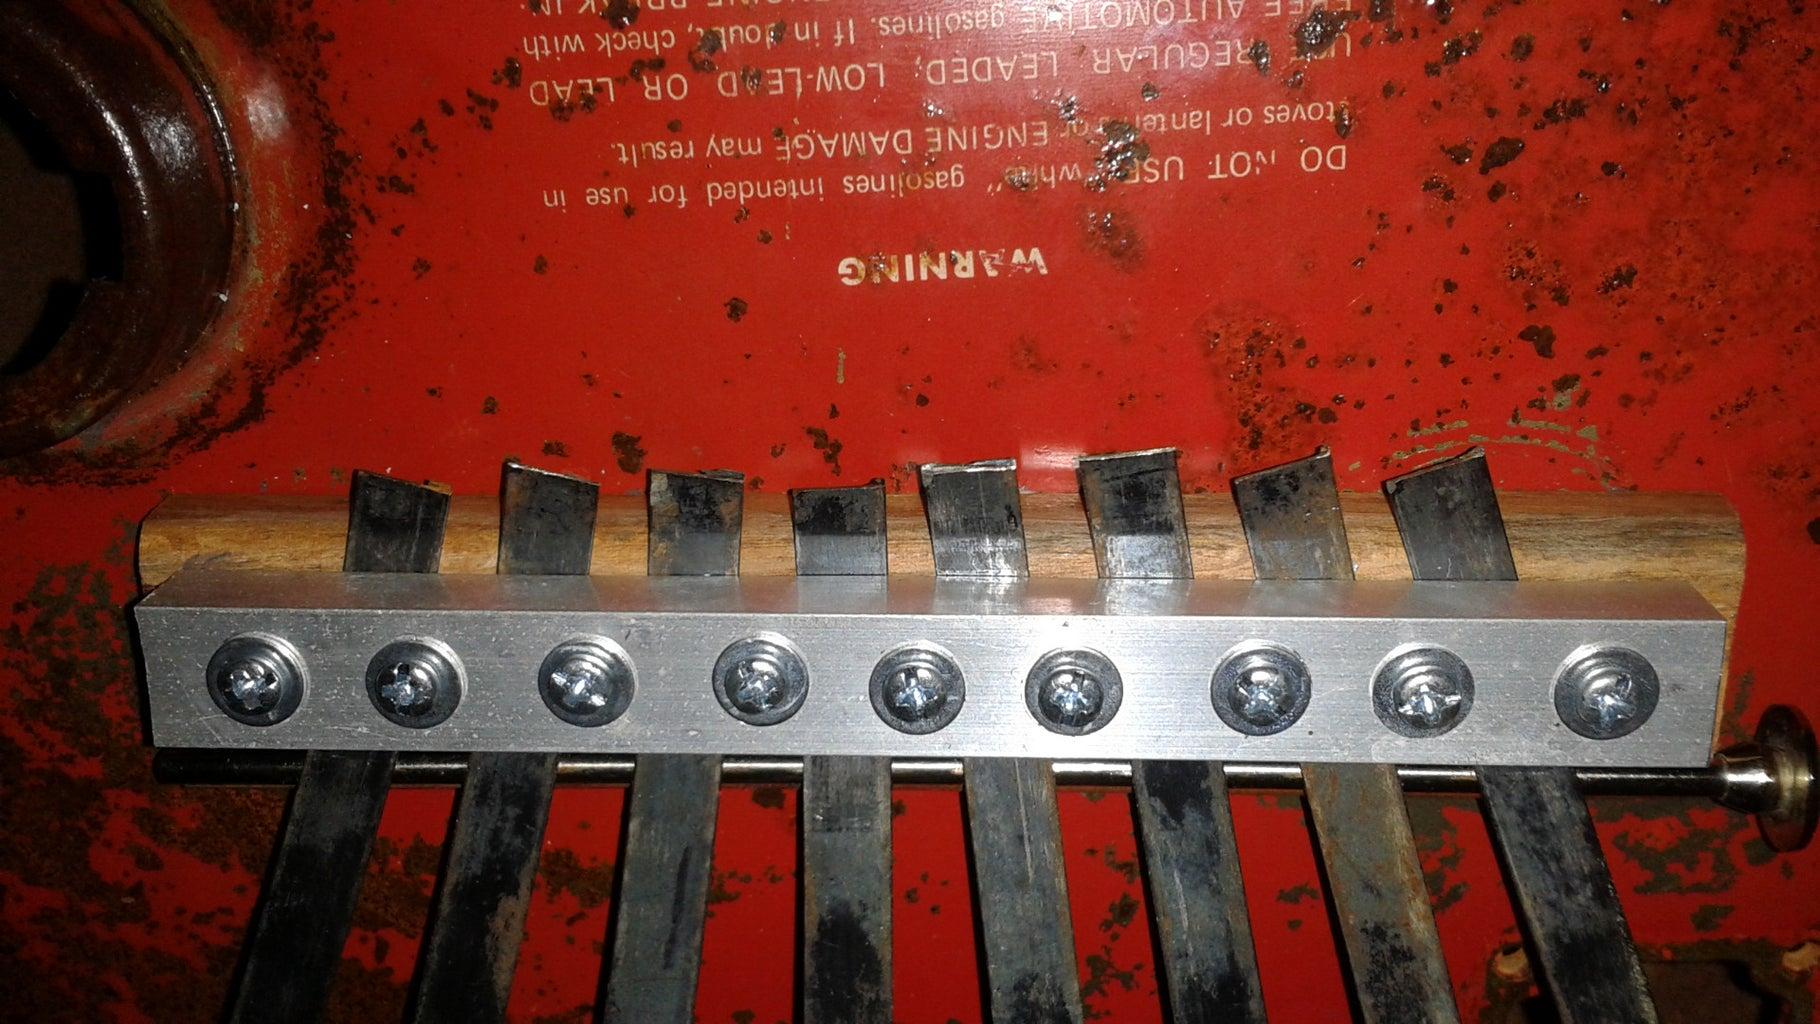 Tuning the Rhumba Box